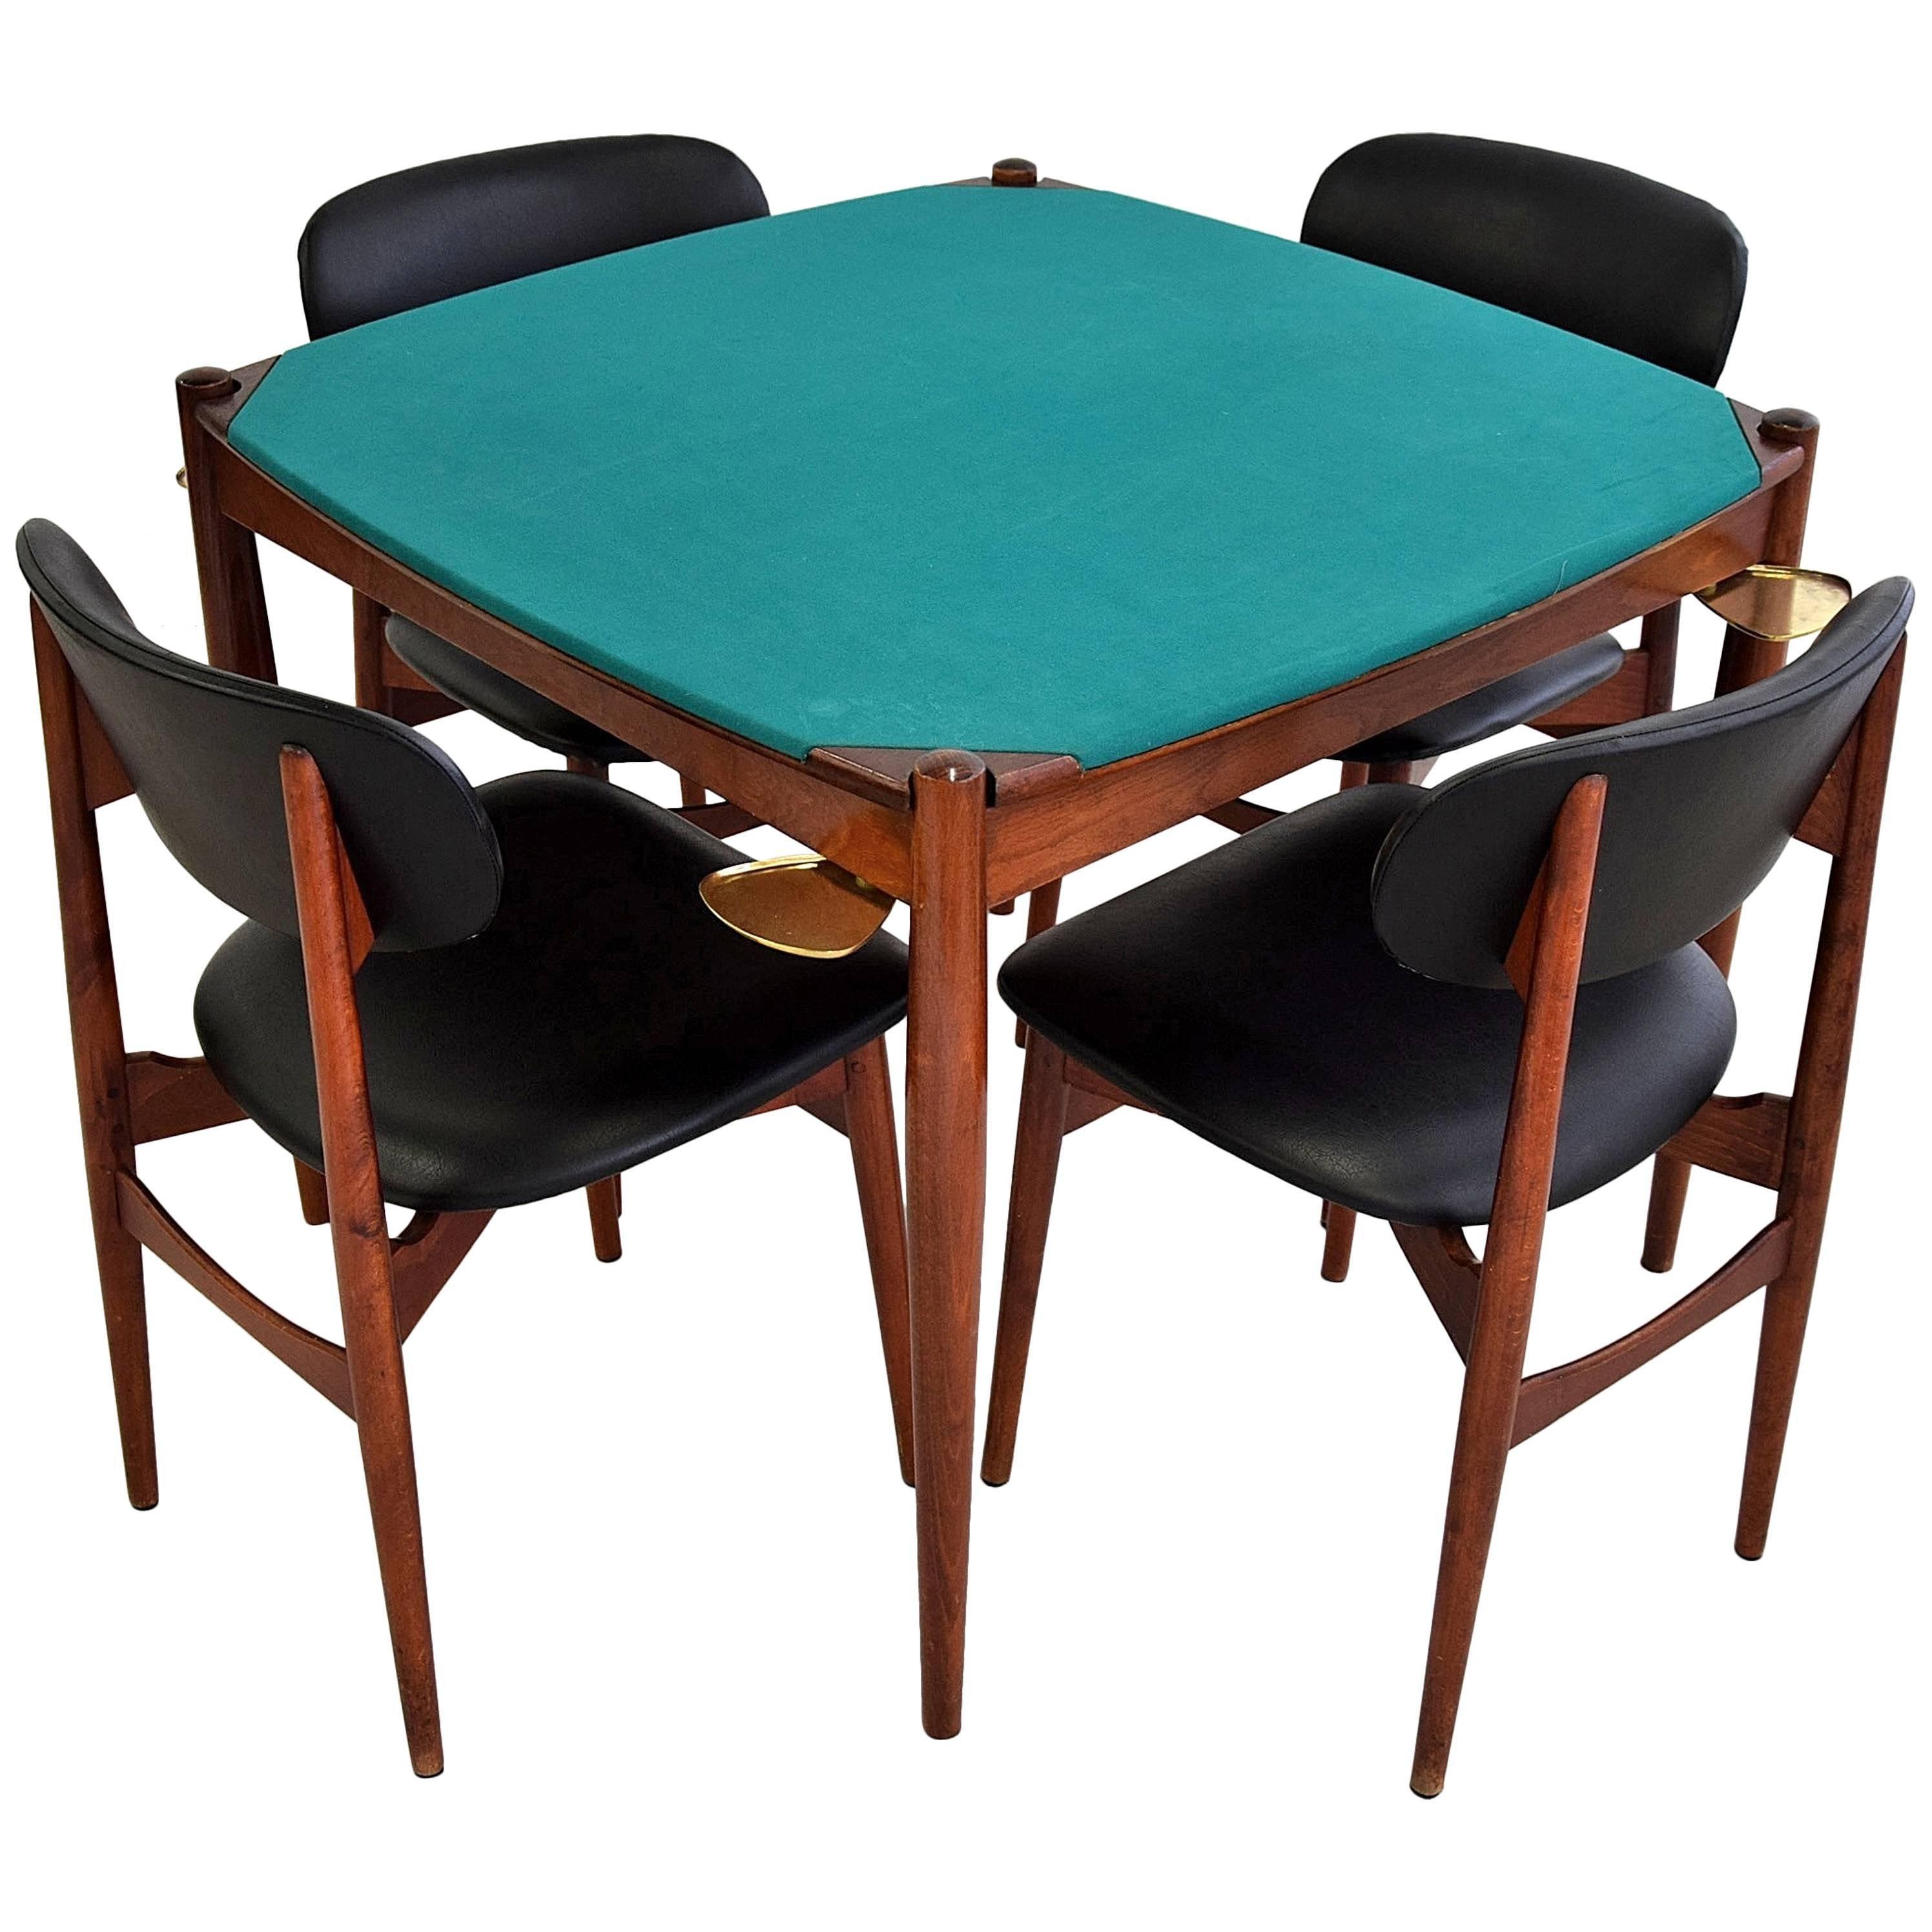 Gio Ponti 1960s Poker Table at 1stdibs